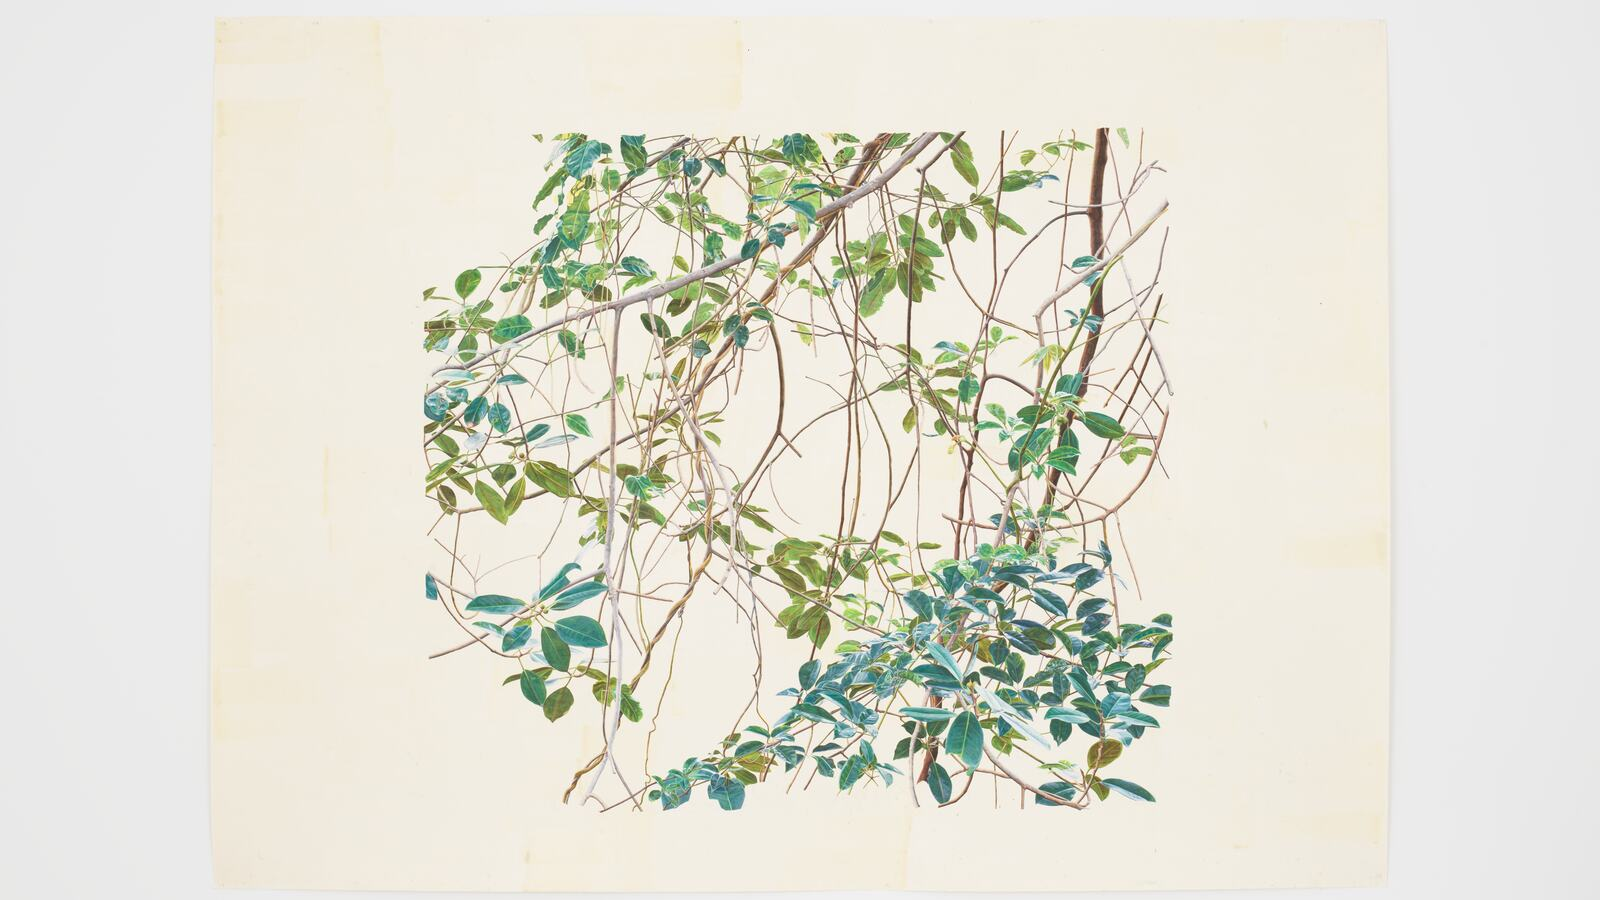 Toba Khedoori, Untitled (branches 1), 2011-2012. © Toba Khedoori 2020. Courtesy the artist and David Zwirner.